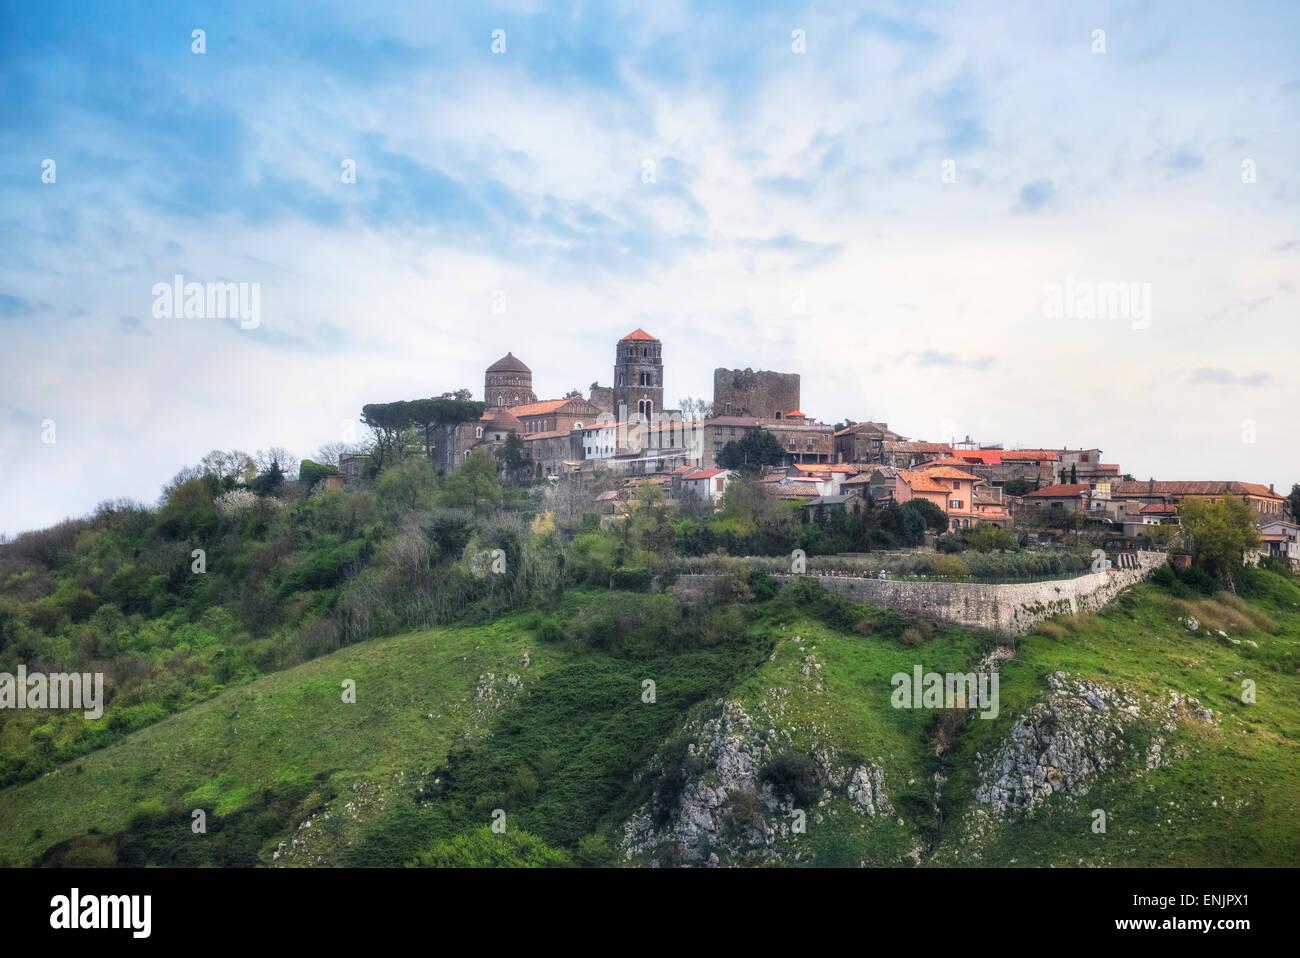 Casertavecchia, Caserta, Campania, Italy Stock Photo